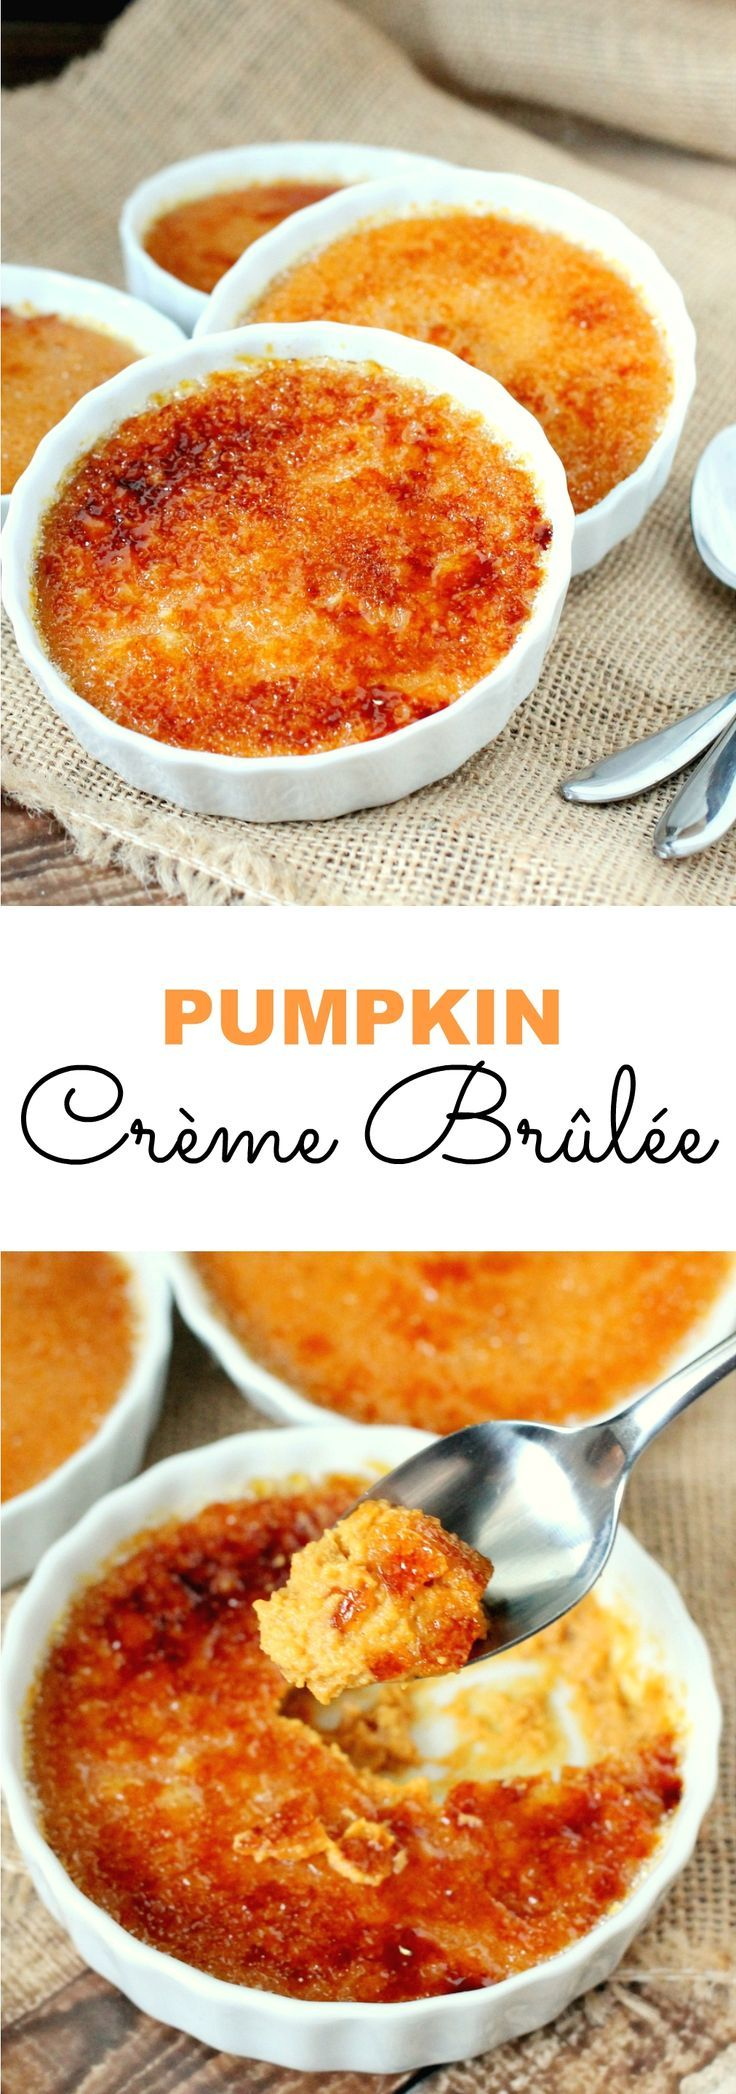 Pumpkin Crème Brulee